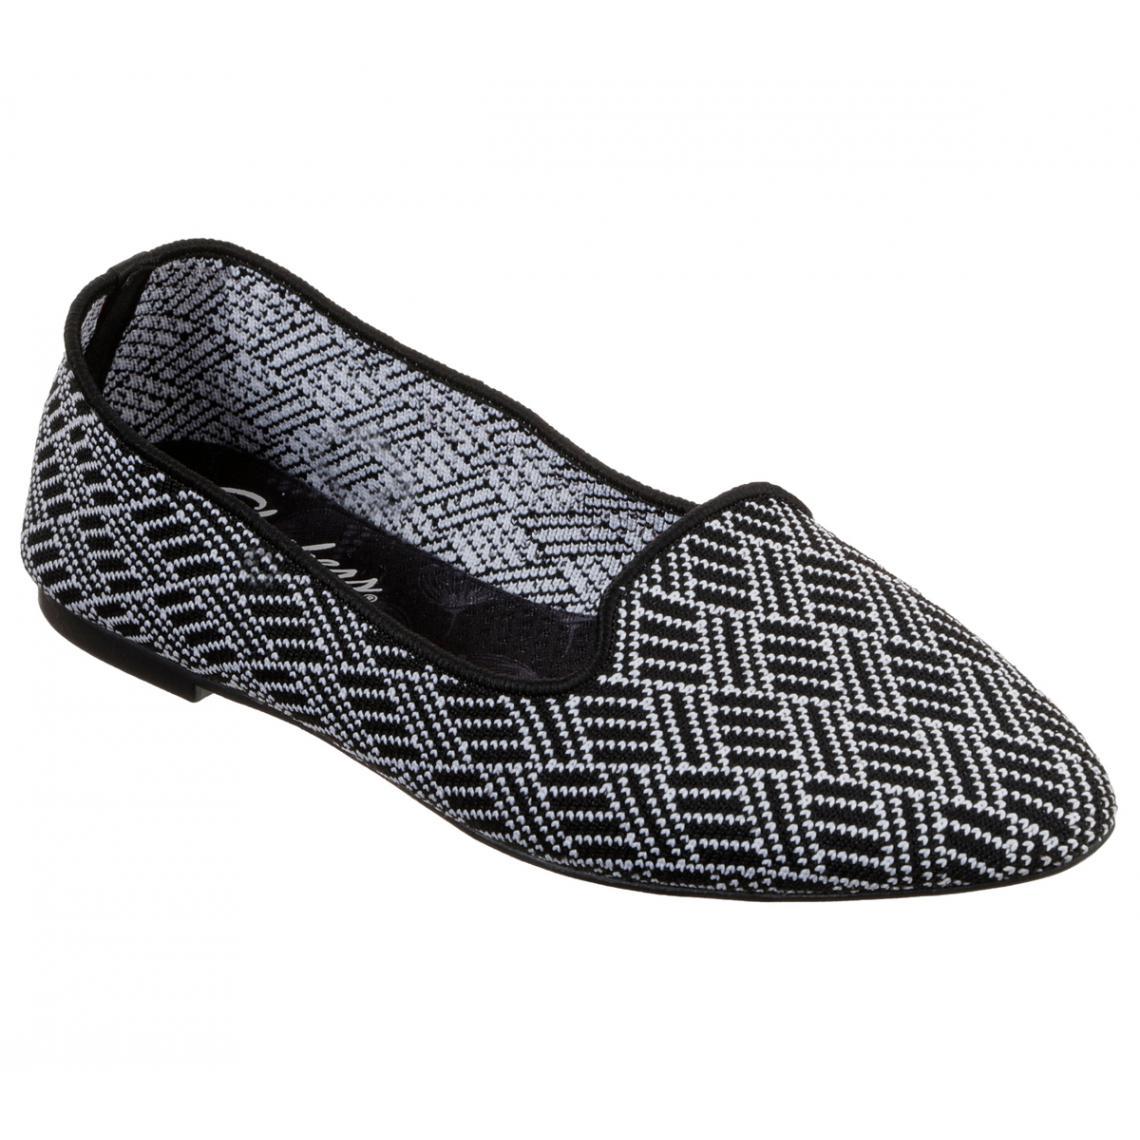 Promo : chaussures basses Noir/blanc cleo huntington - Skechers - Modalova